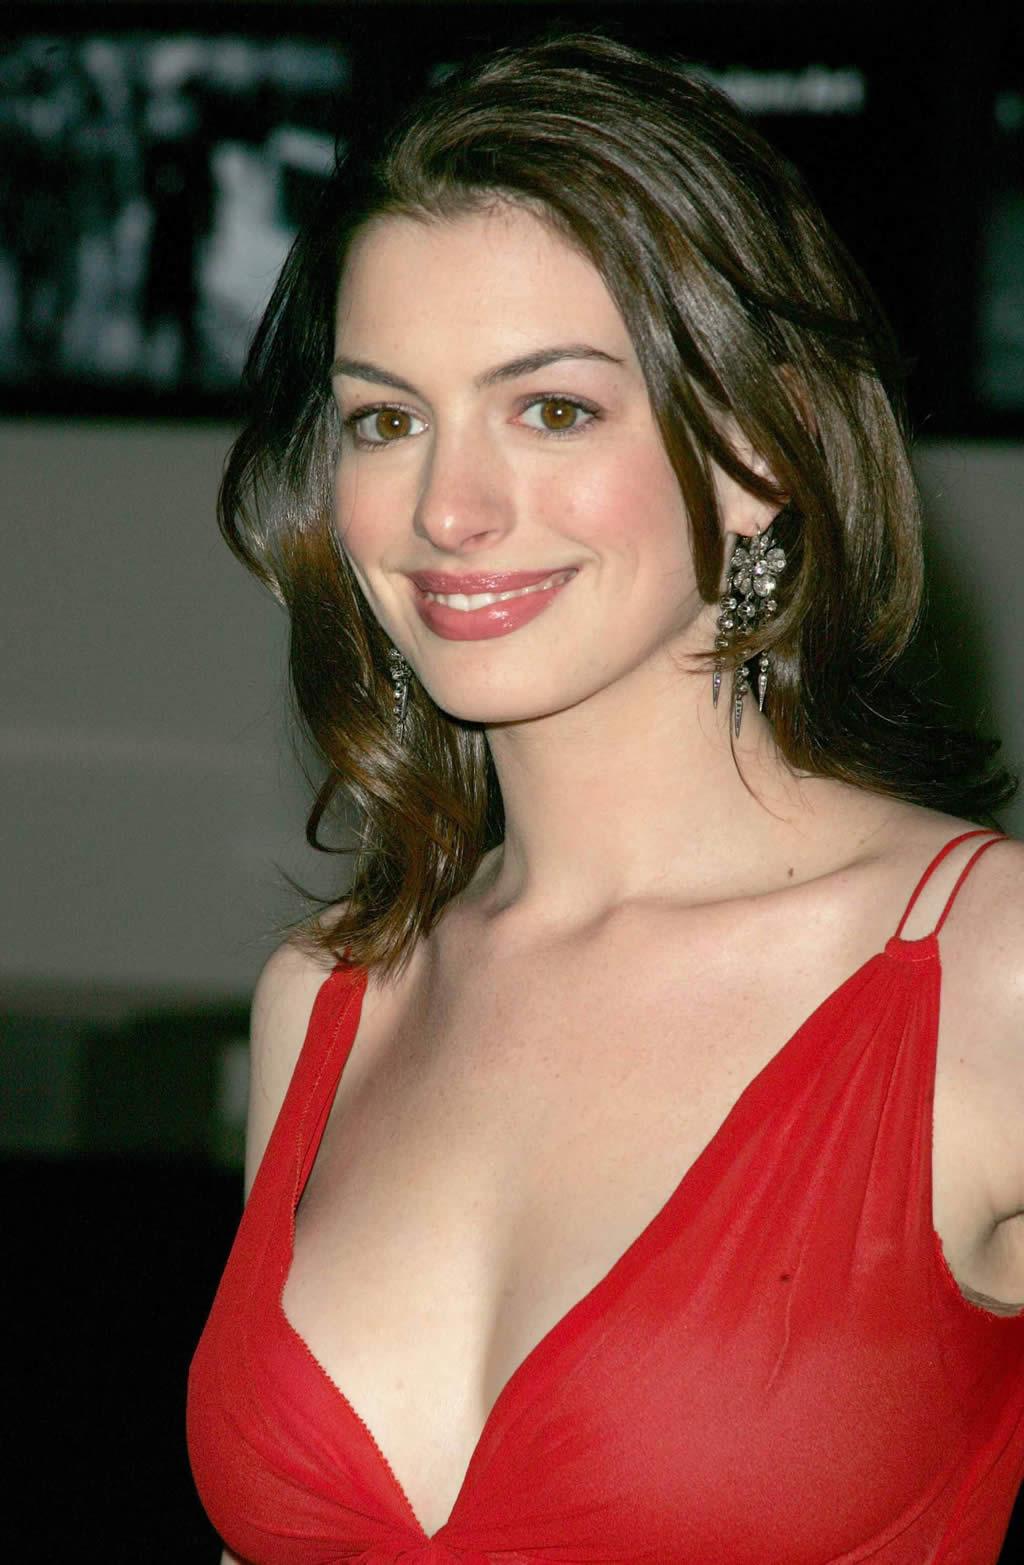 hollywood wallpedia: hollywood actress photos